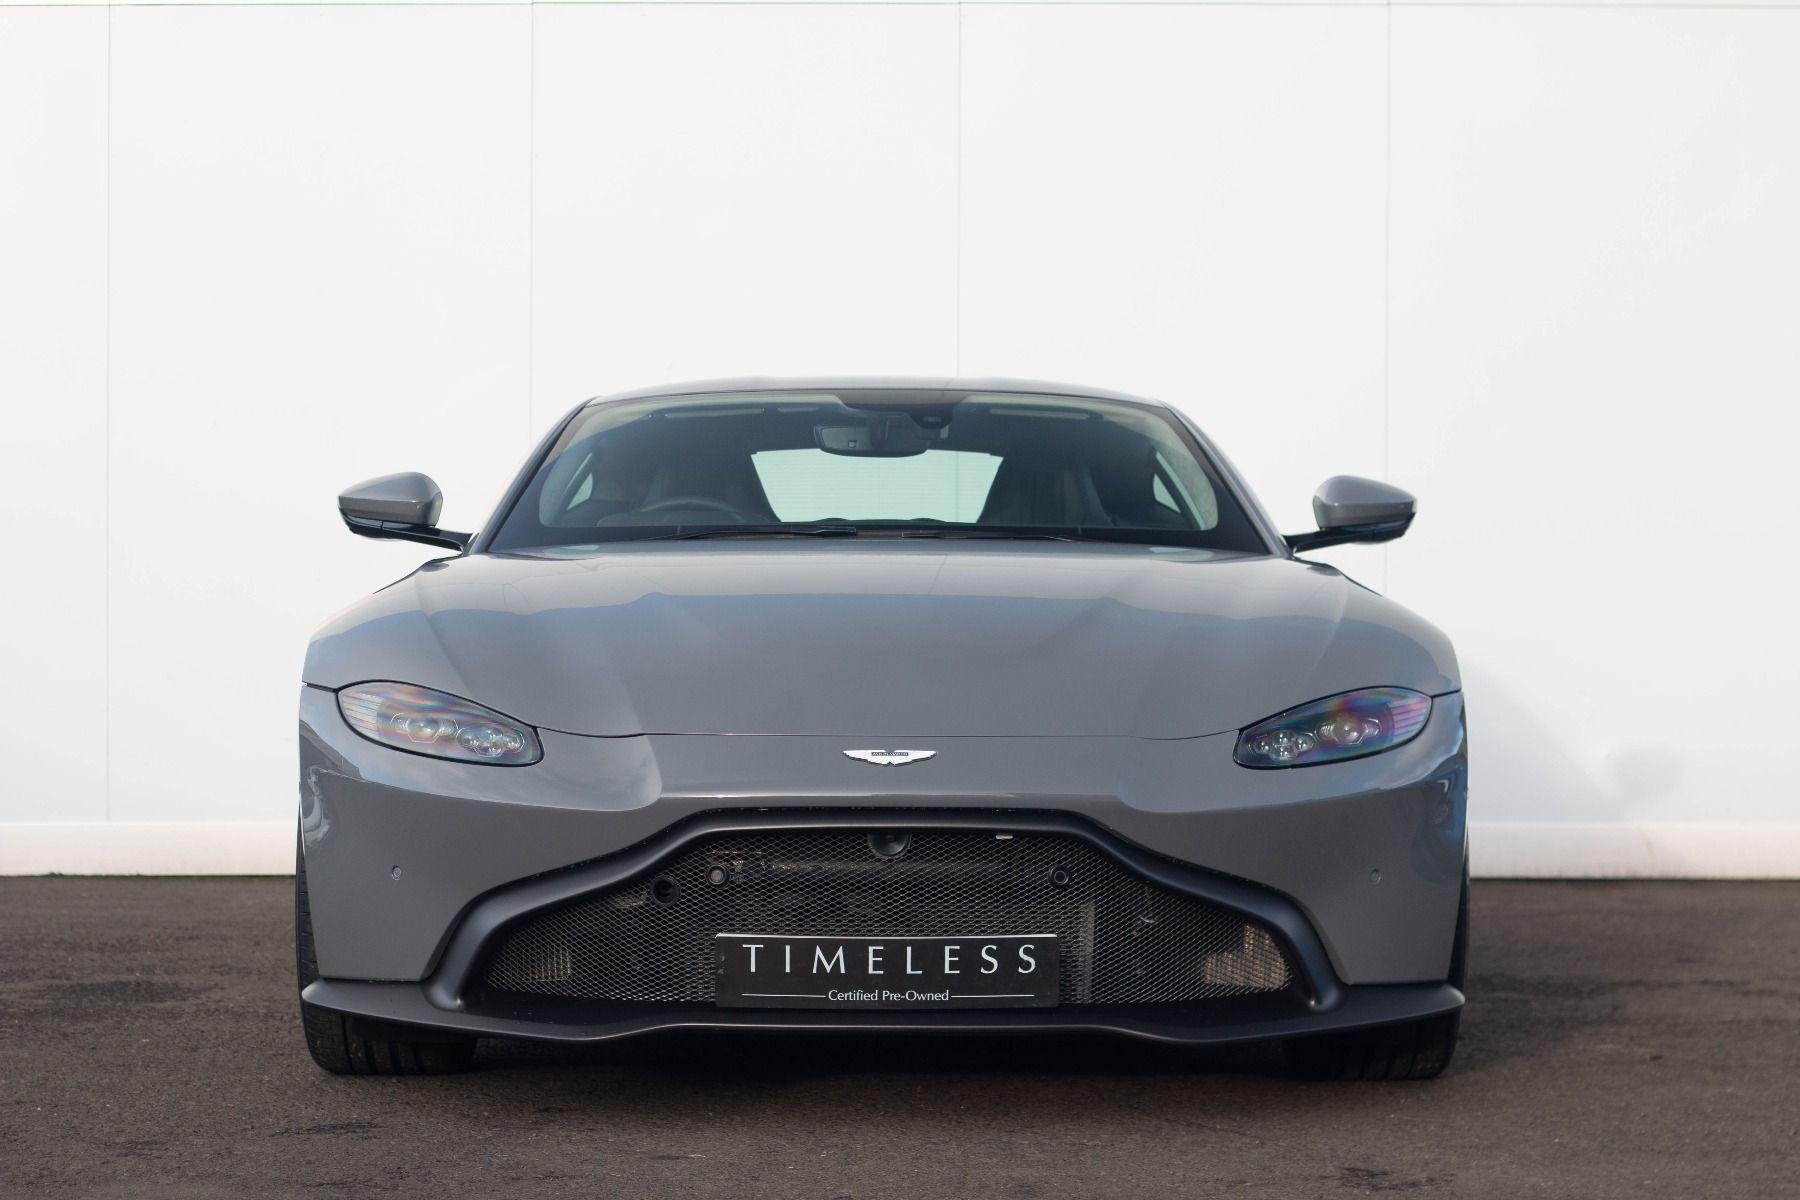 Aston Martin V8 Vantage Coupe 2dr ZF 8 Speed image 2